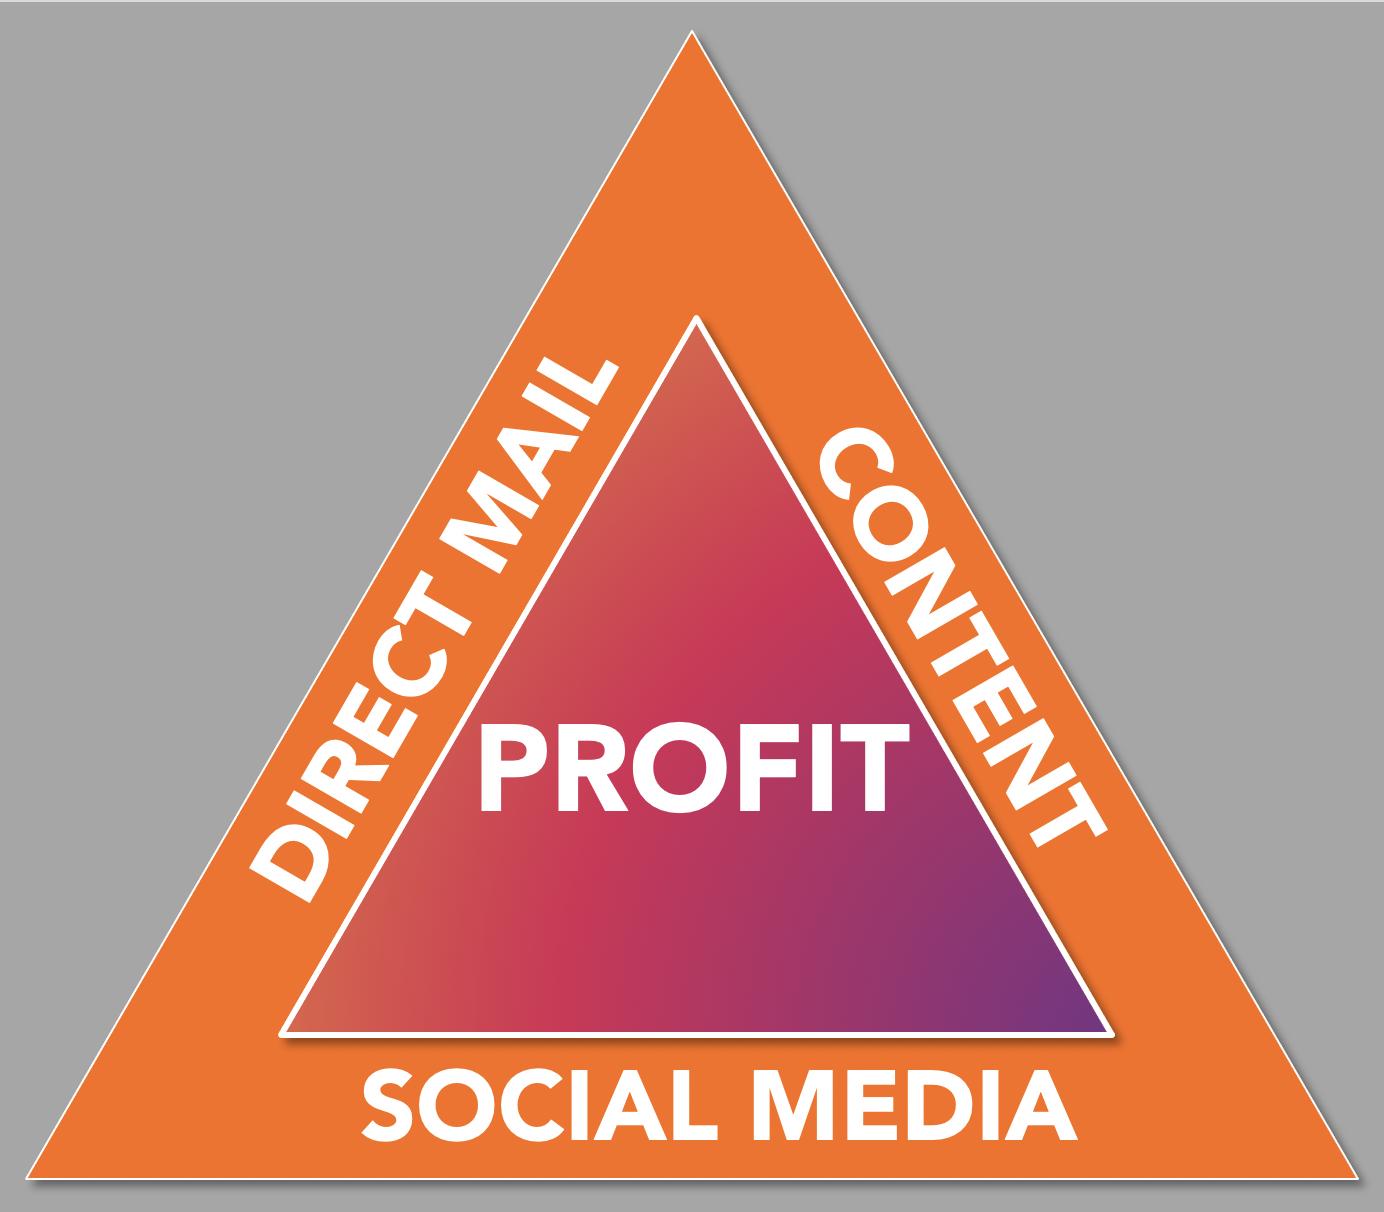 profit-pyramid